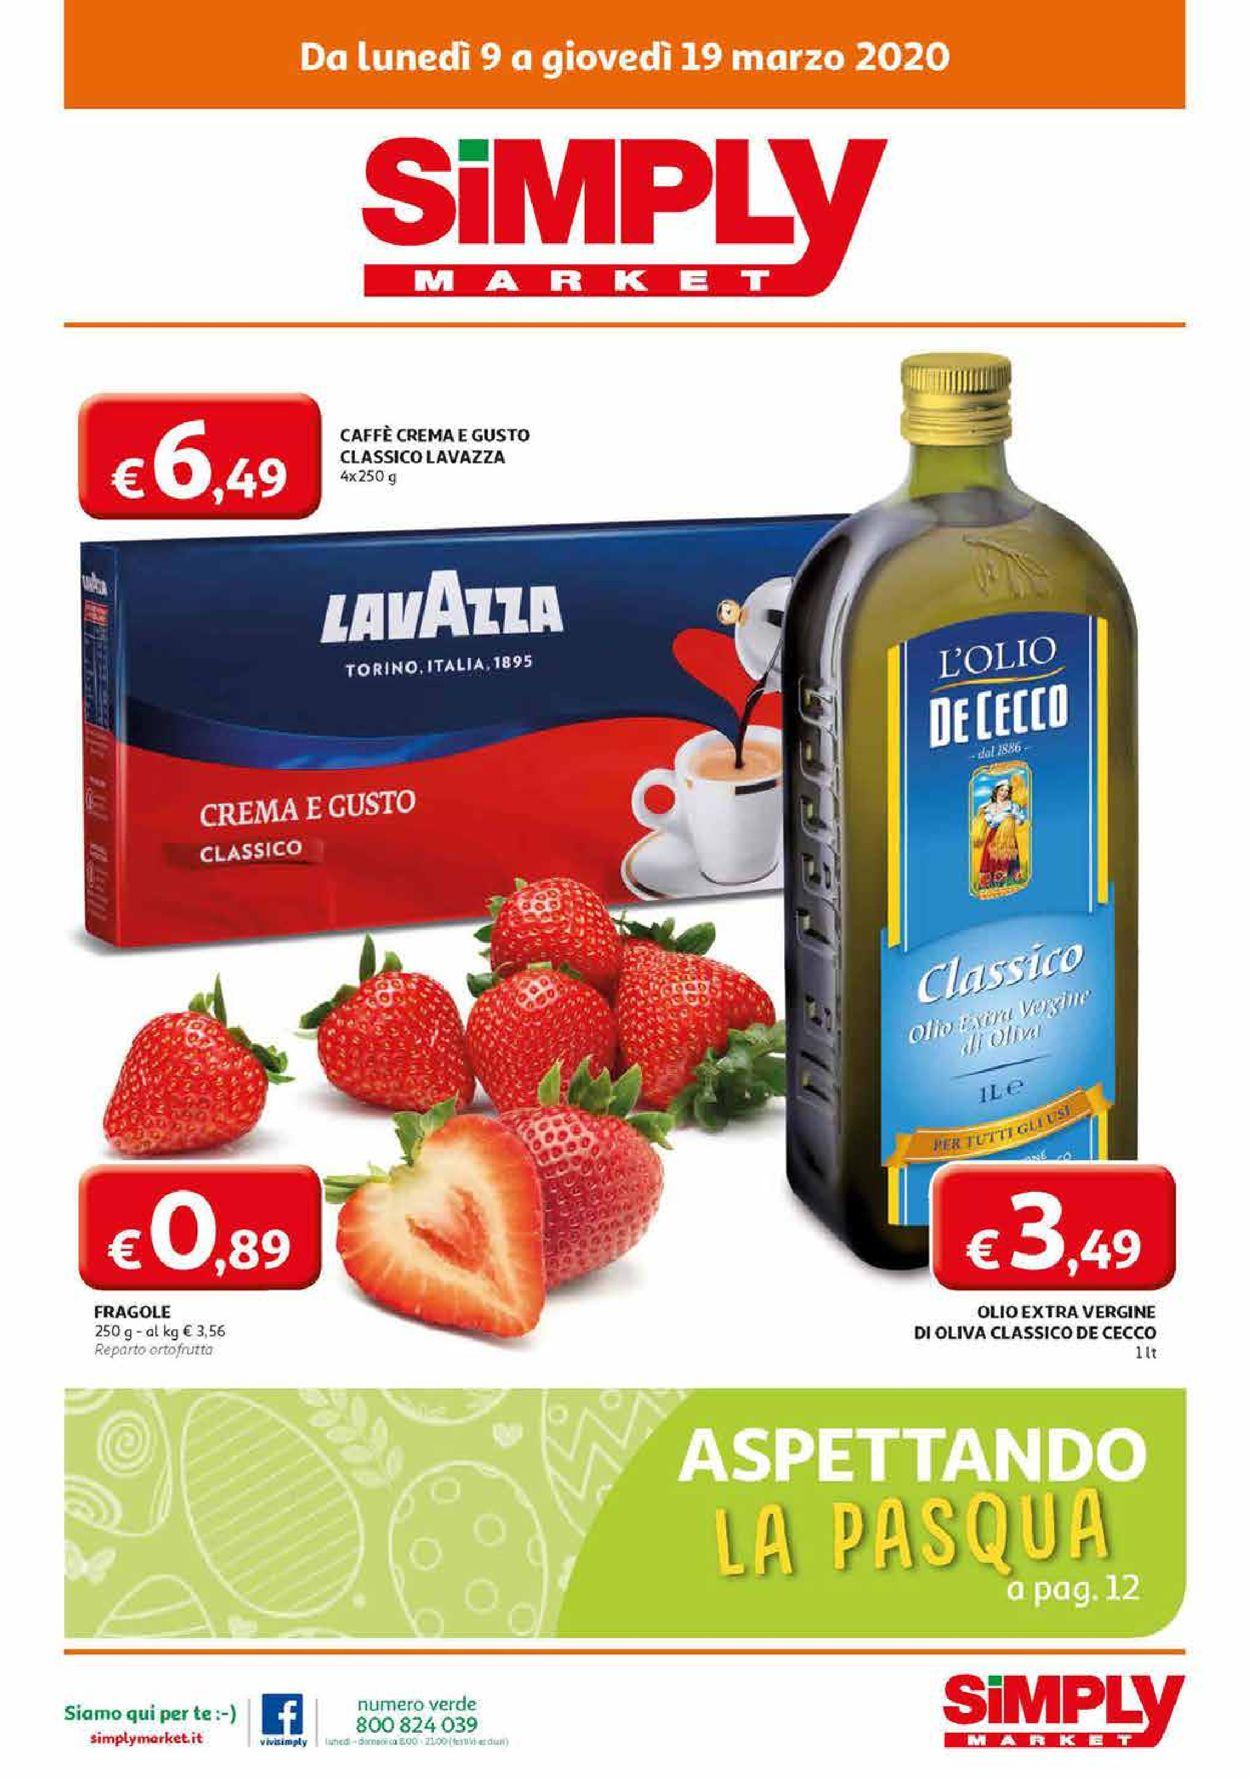 Volantino Simply Market - Offerte 09/03-19/03/2020